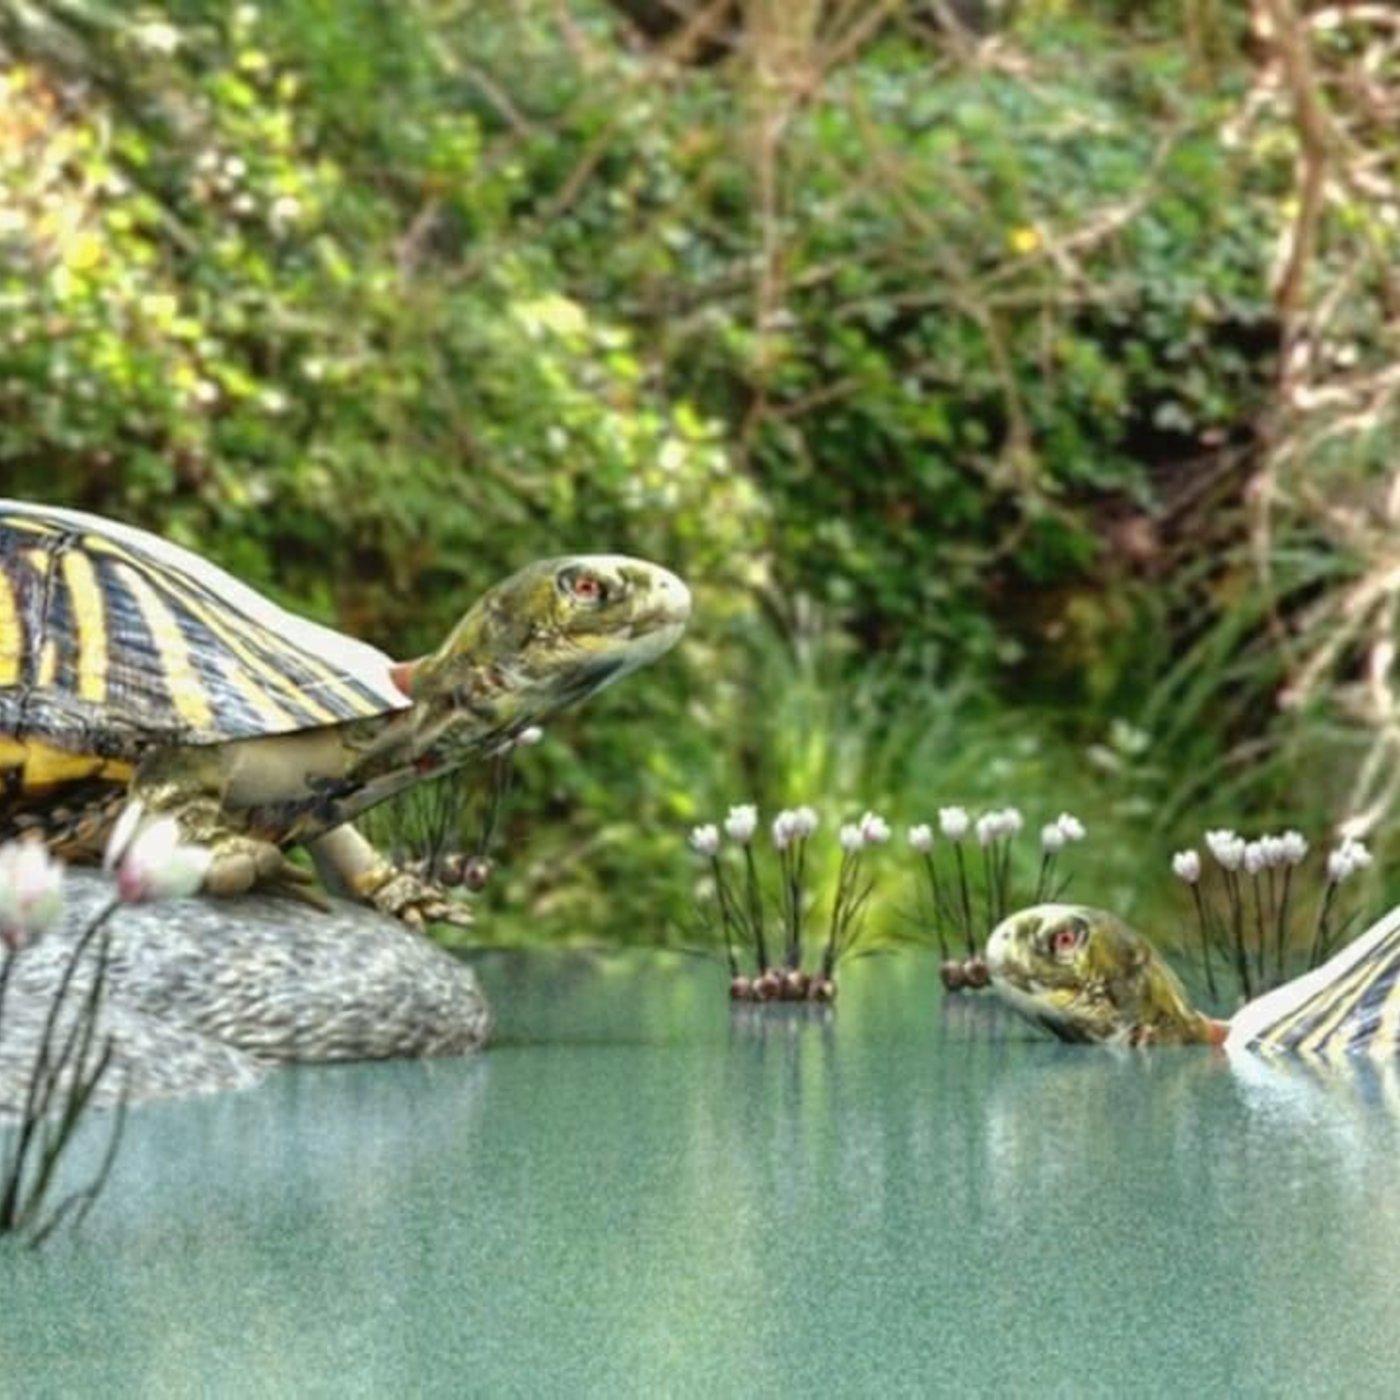 Turtles sitting on rock